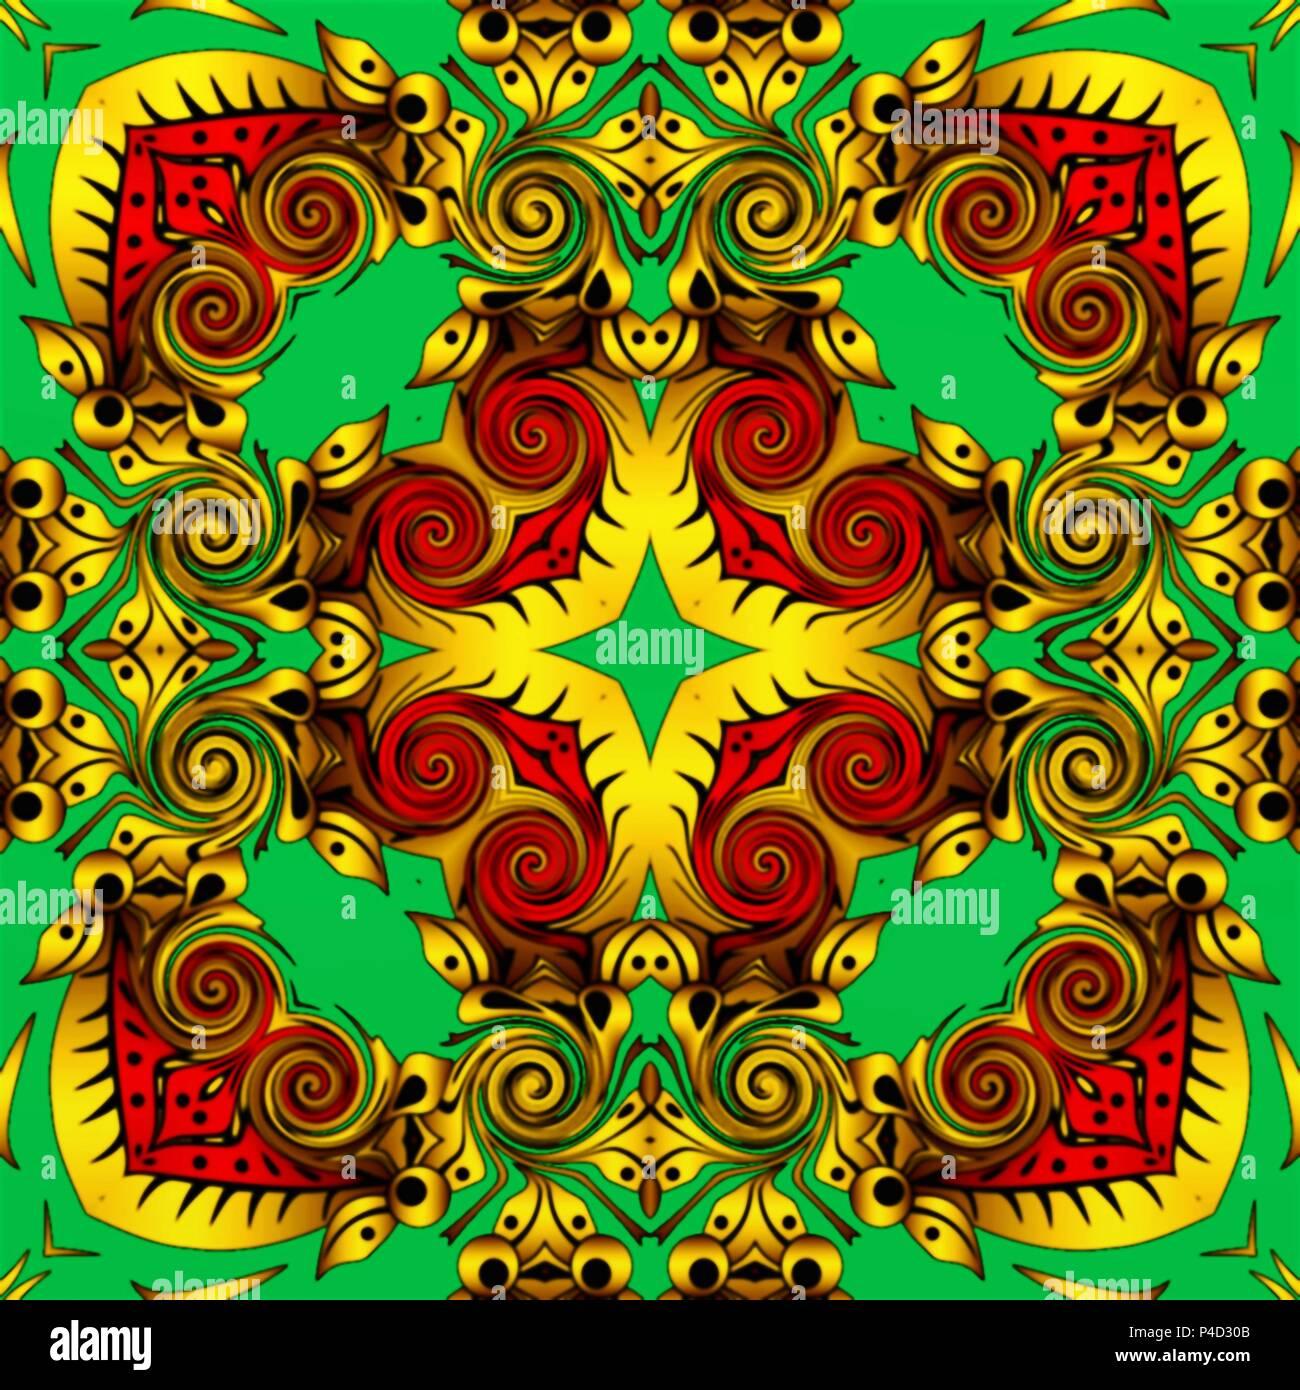 Abstract Geometry Of Modern Art Mystical Eastern Mandala Floral Kaleidoscope Traditional